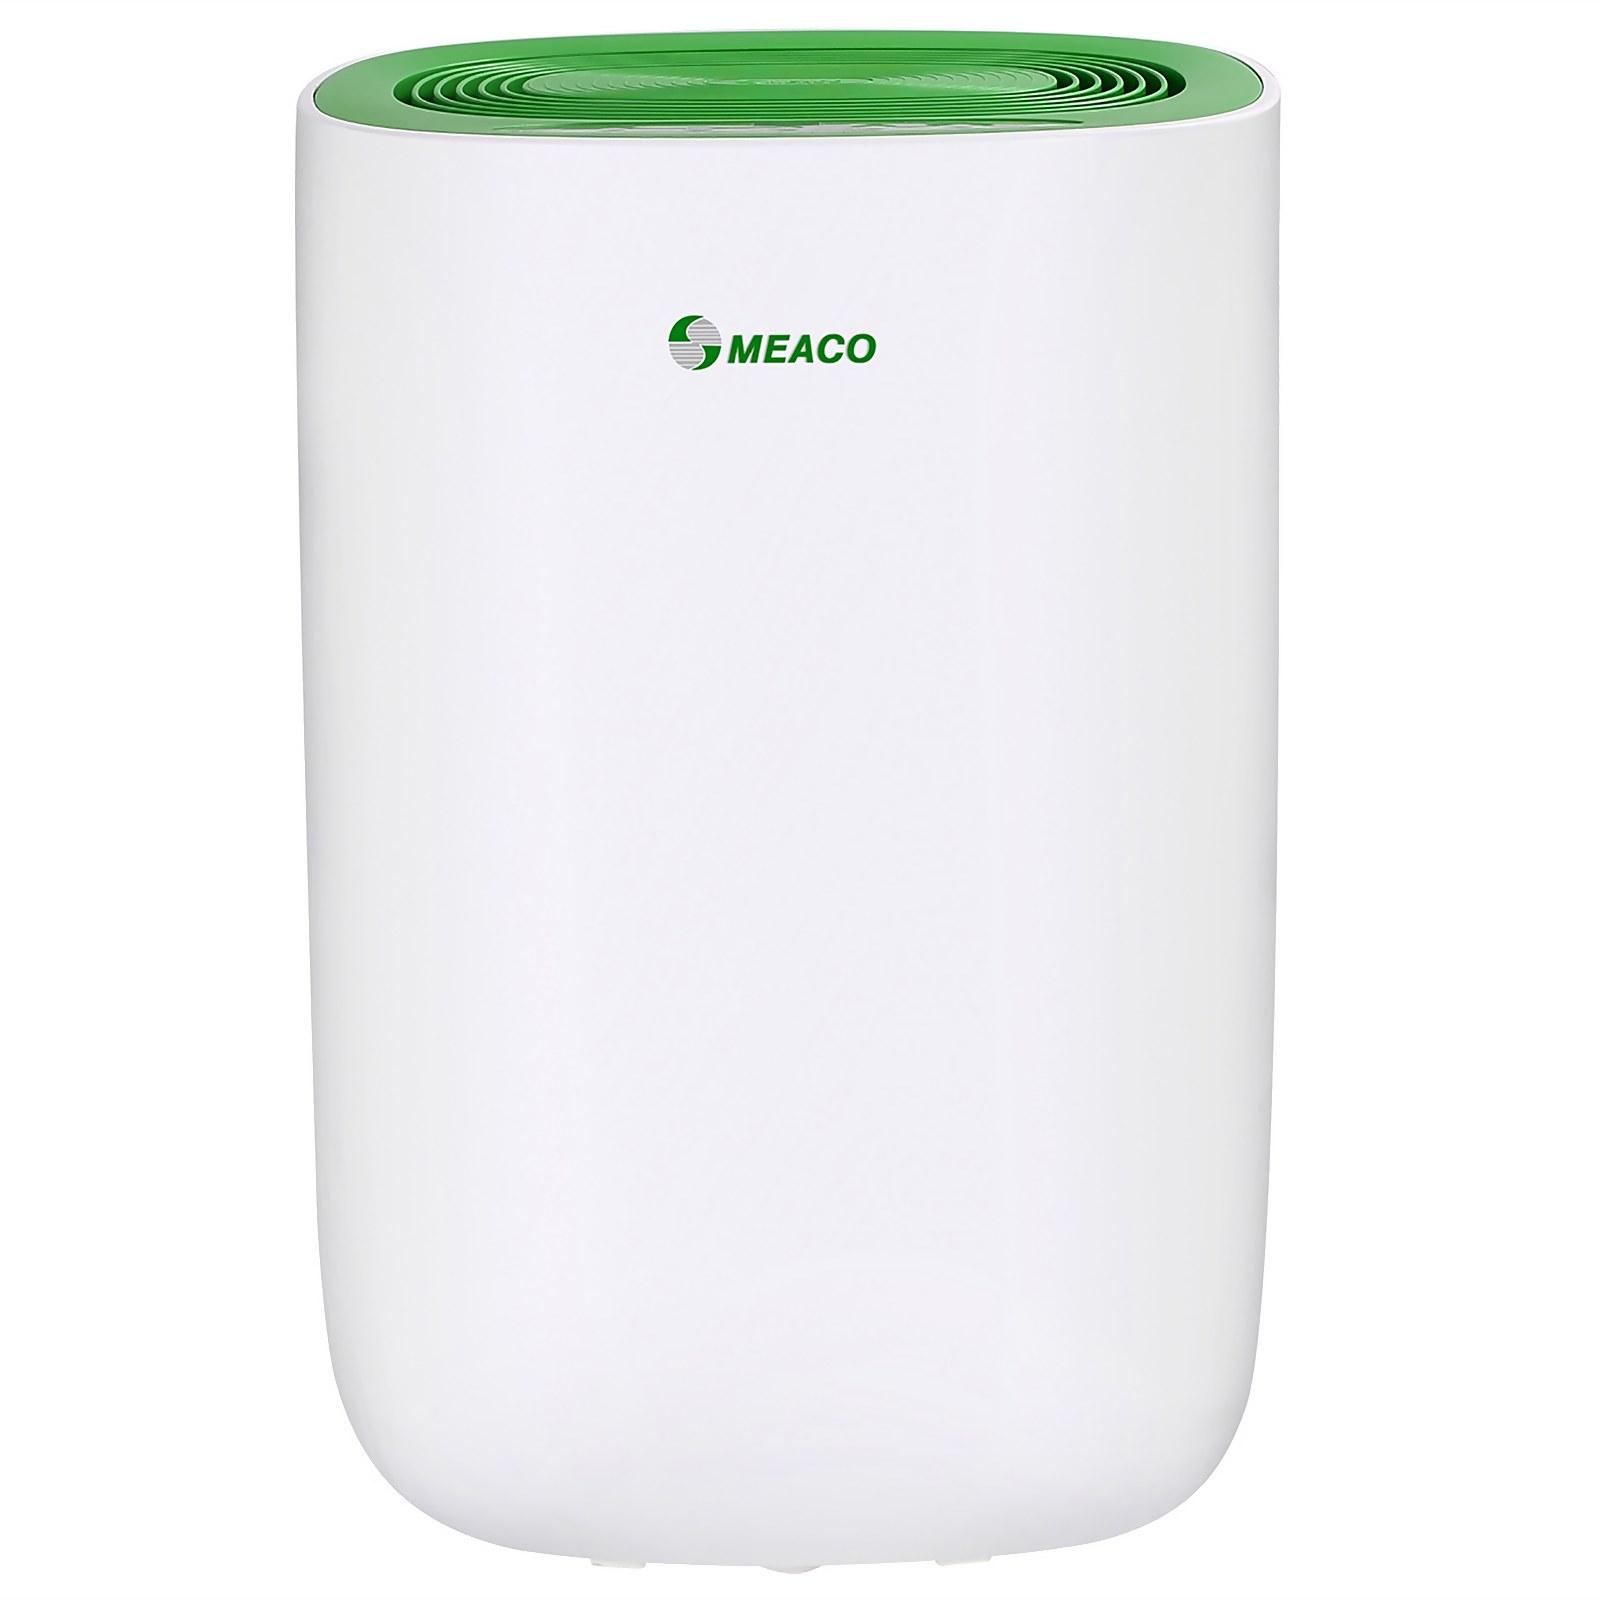 Meaco Dry ABC 10L Dehumidifier - Green